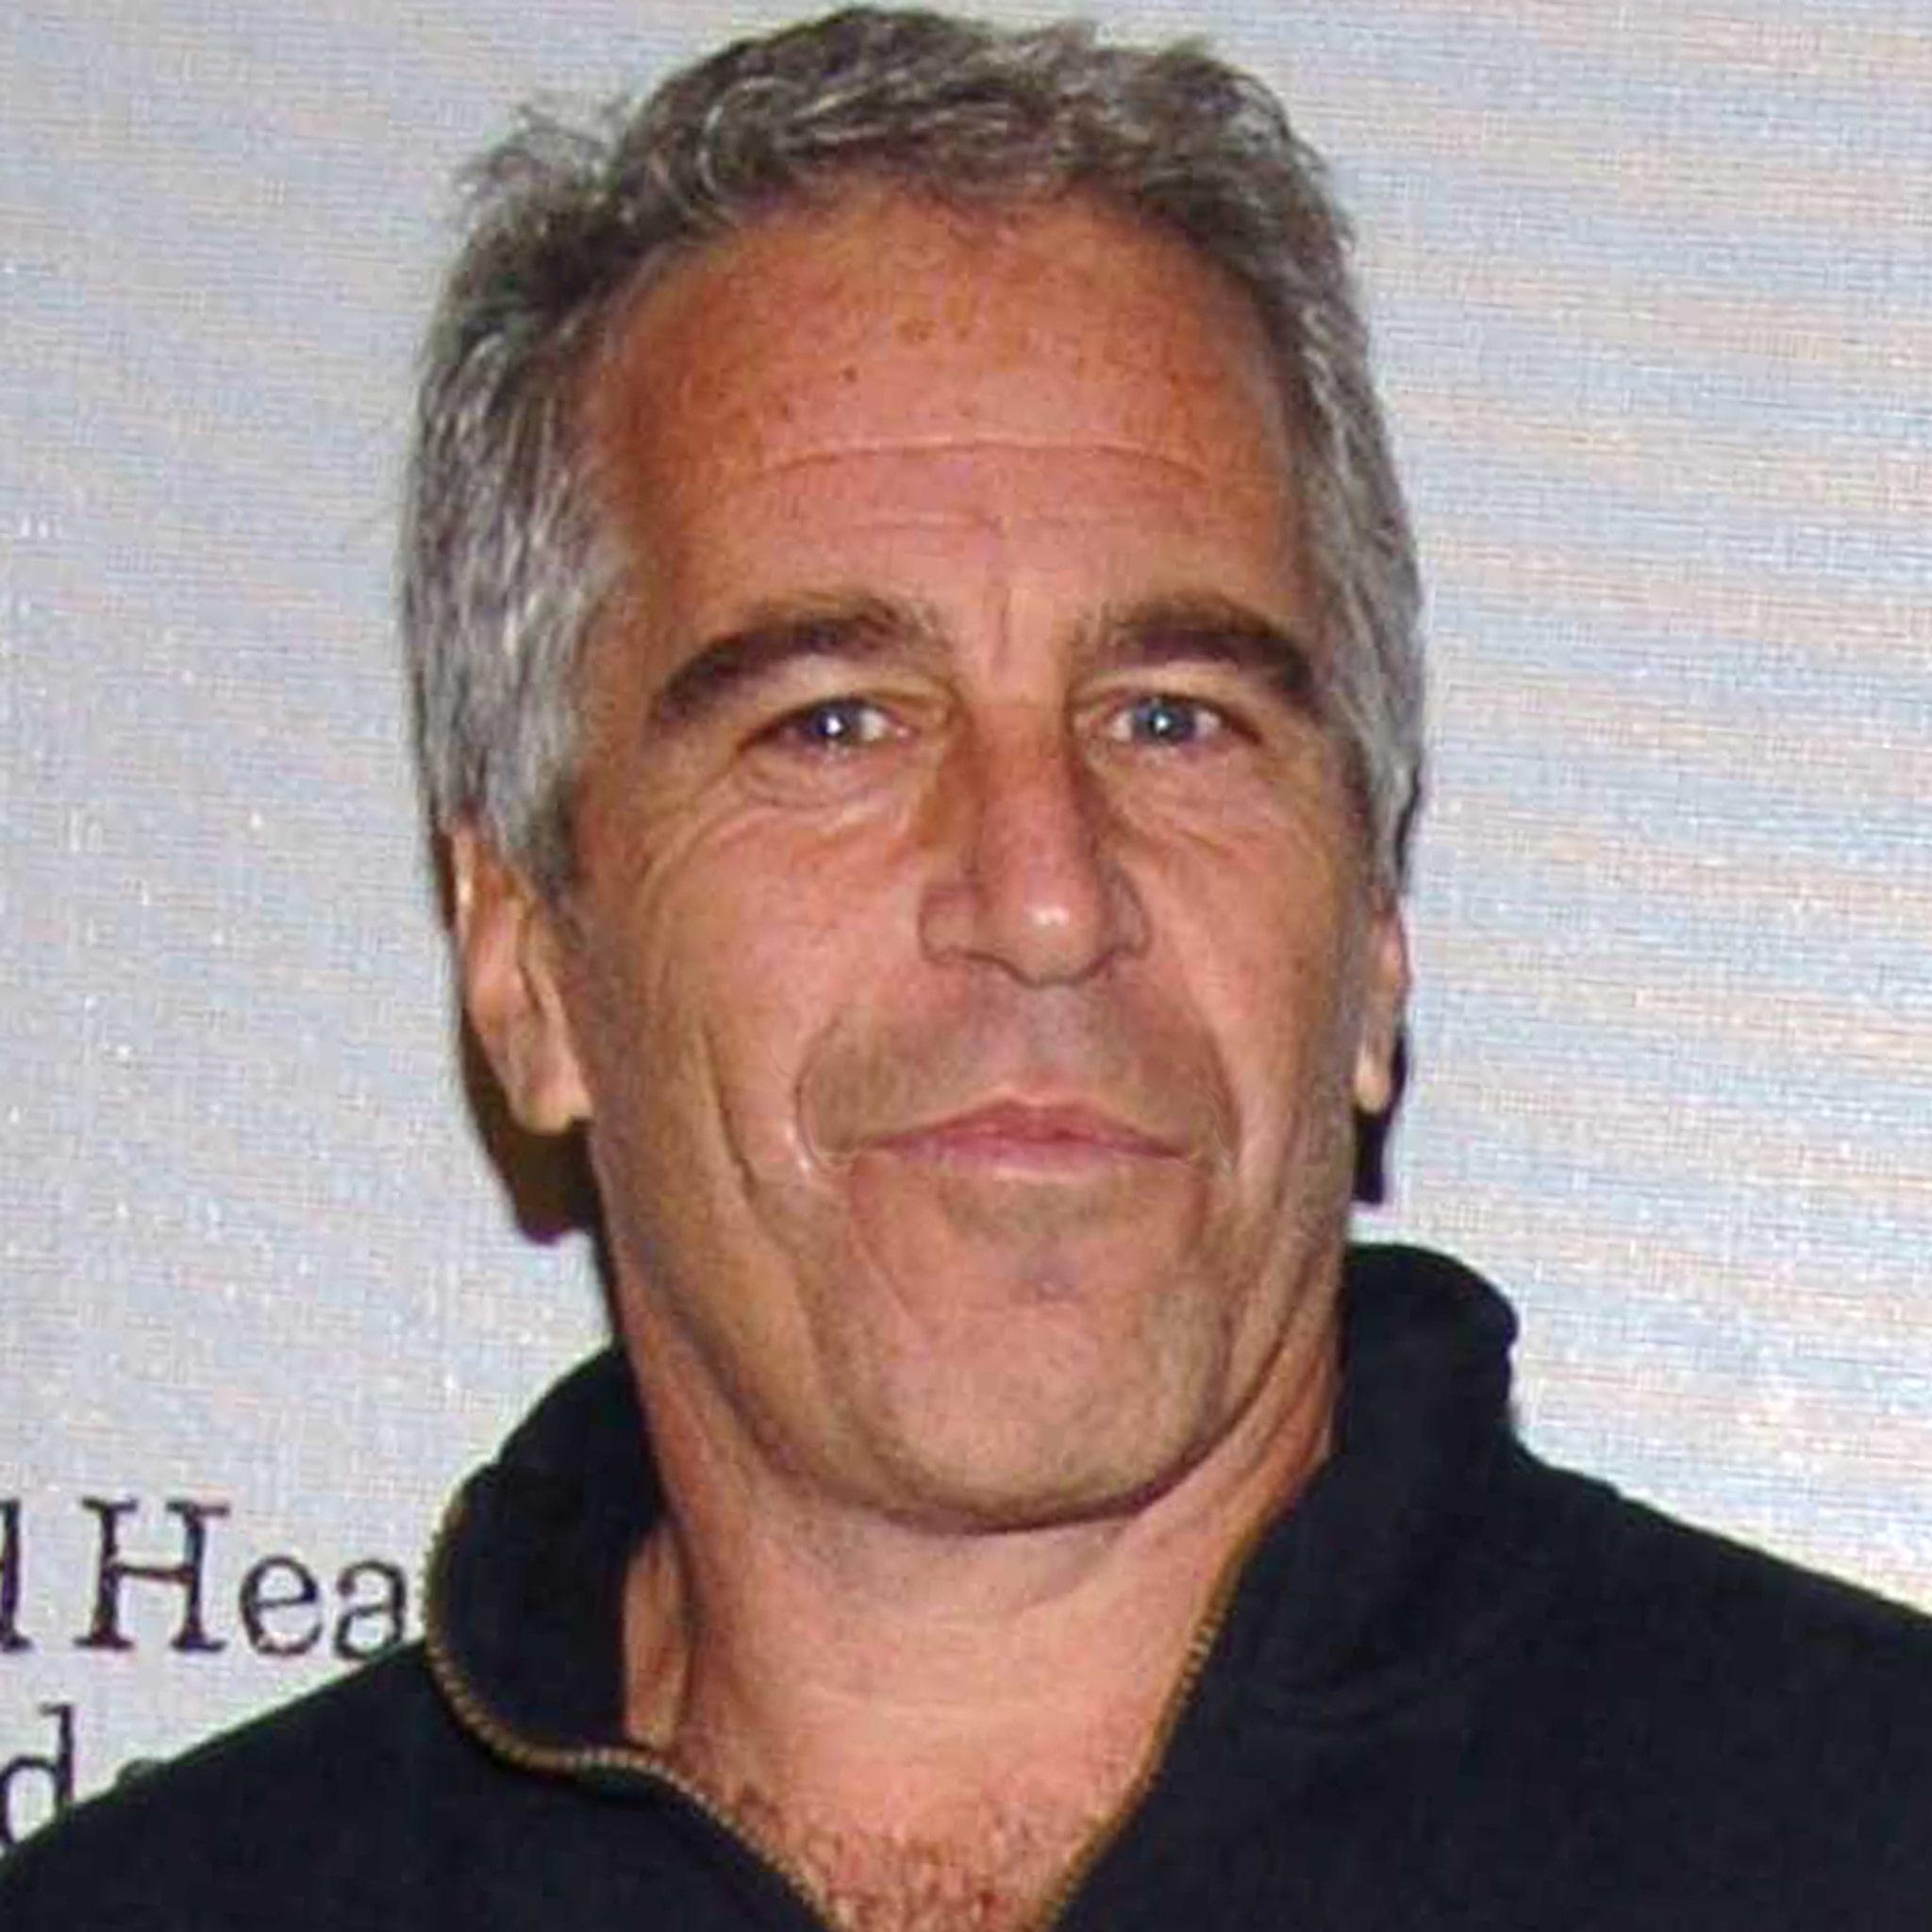 Jeffrey Epstein Signed Will Two Days Before Death, Worth Half a Billion